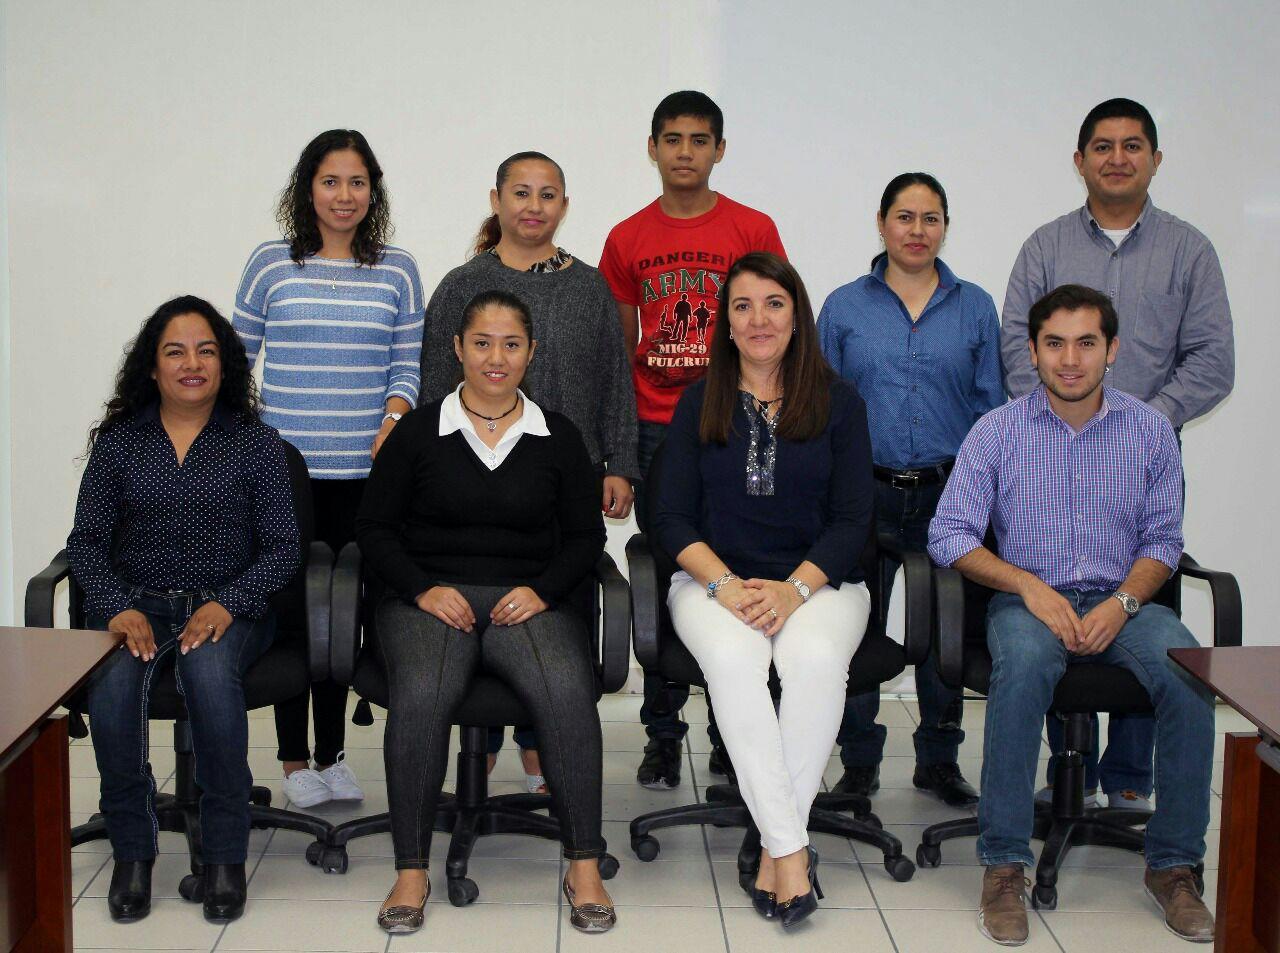 Alumnos de la UT de Tehuacán ganan beca para estudiar en Canadá